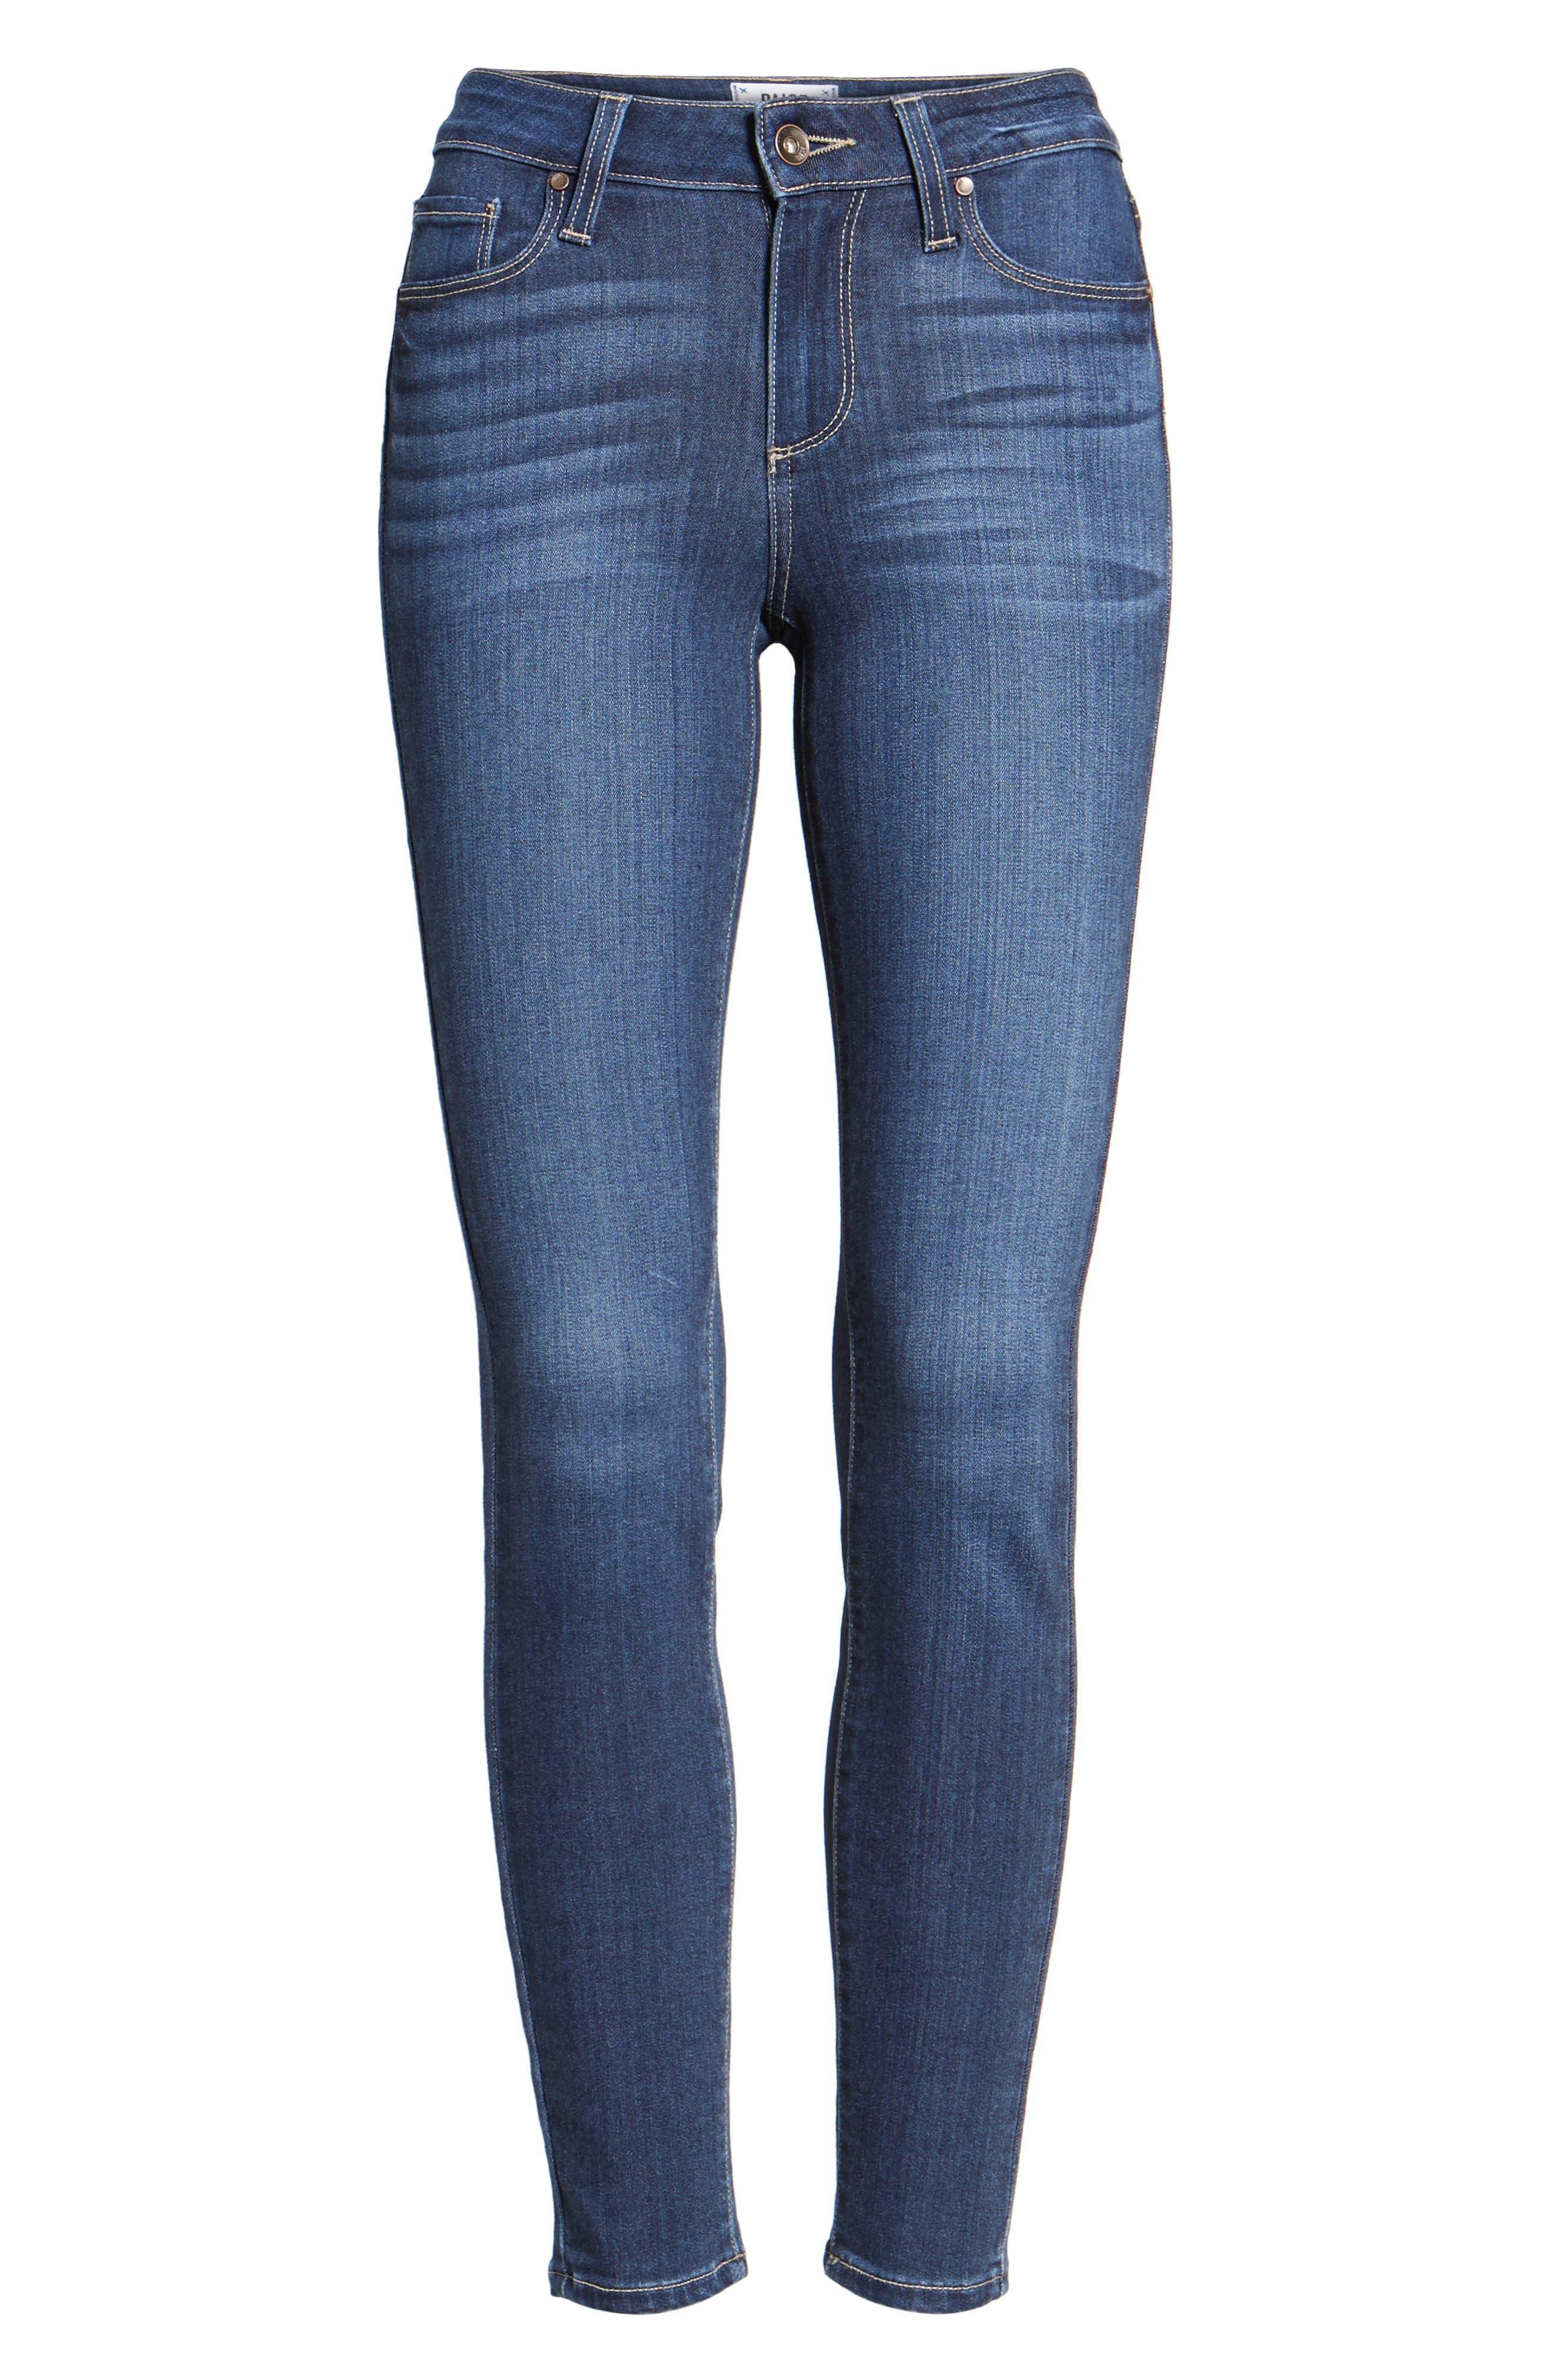 Transcend - Verdugo Ankle Skinny Jeans,                             Alternate thumbnail 6, color,                             Blue